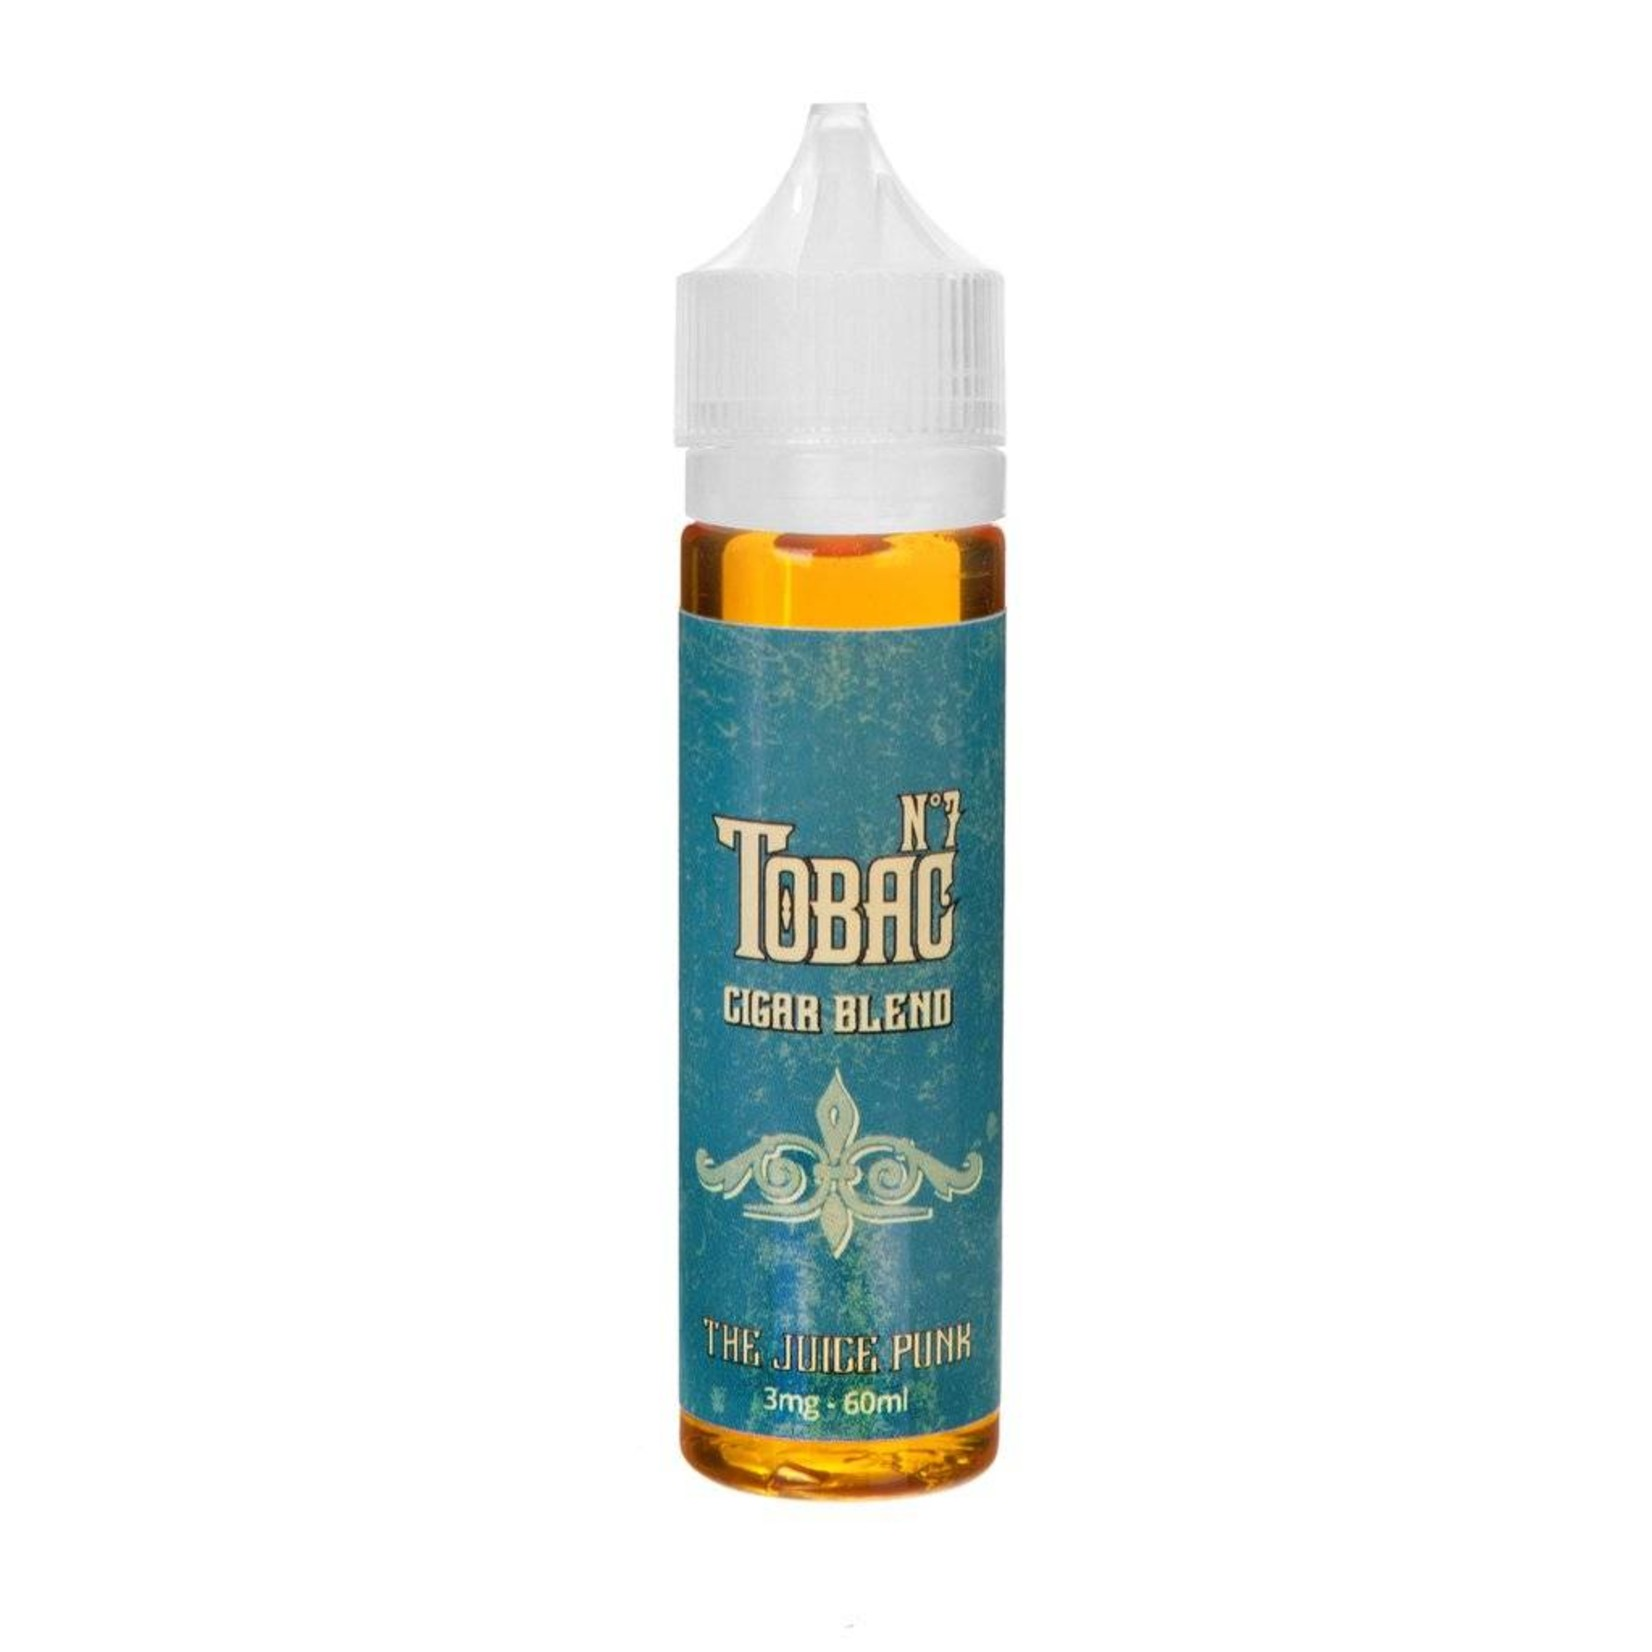 The Juice Punk Tobak No.7 Cigar Blend